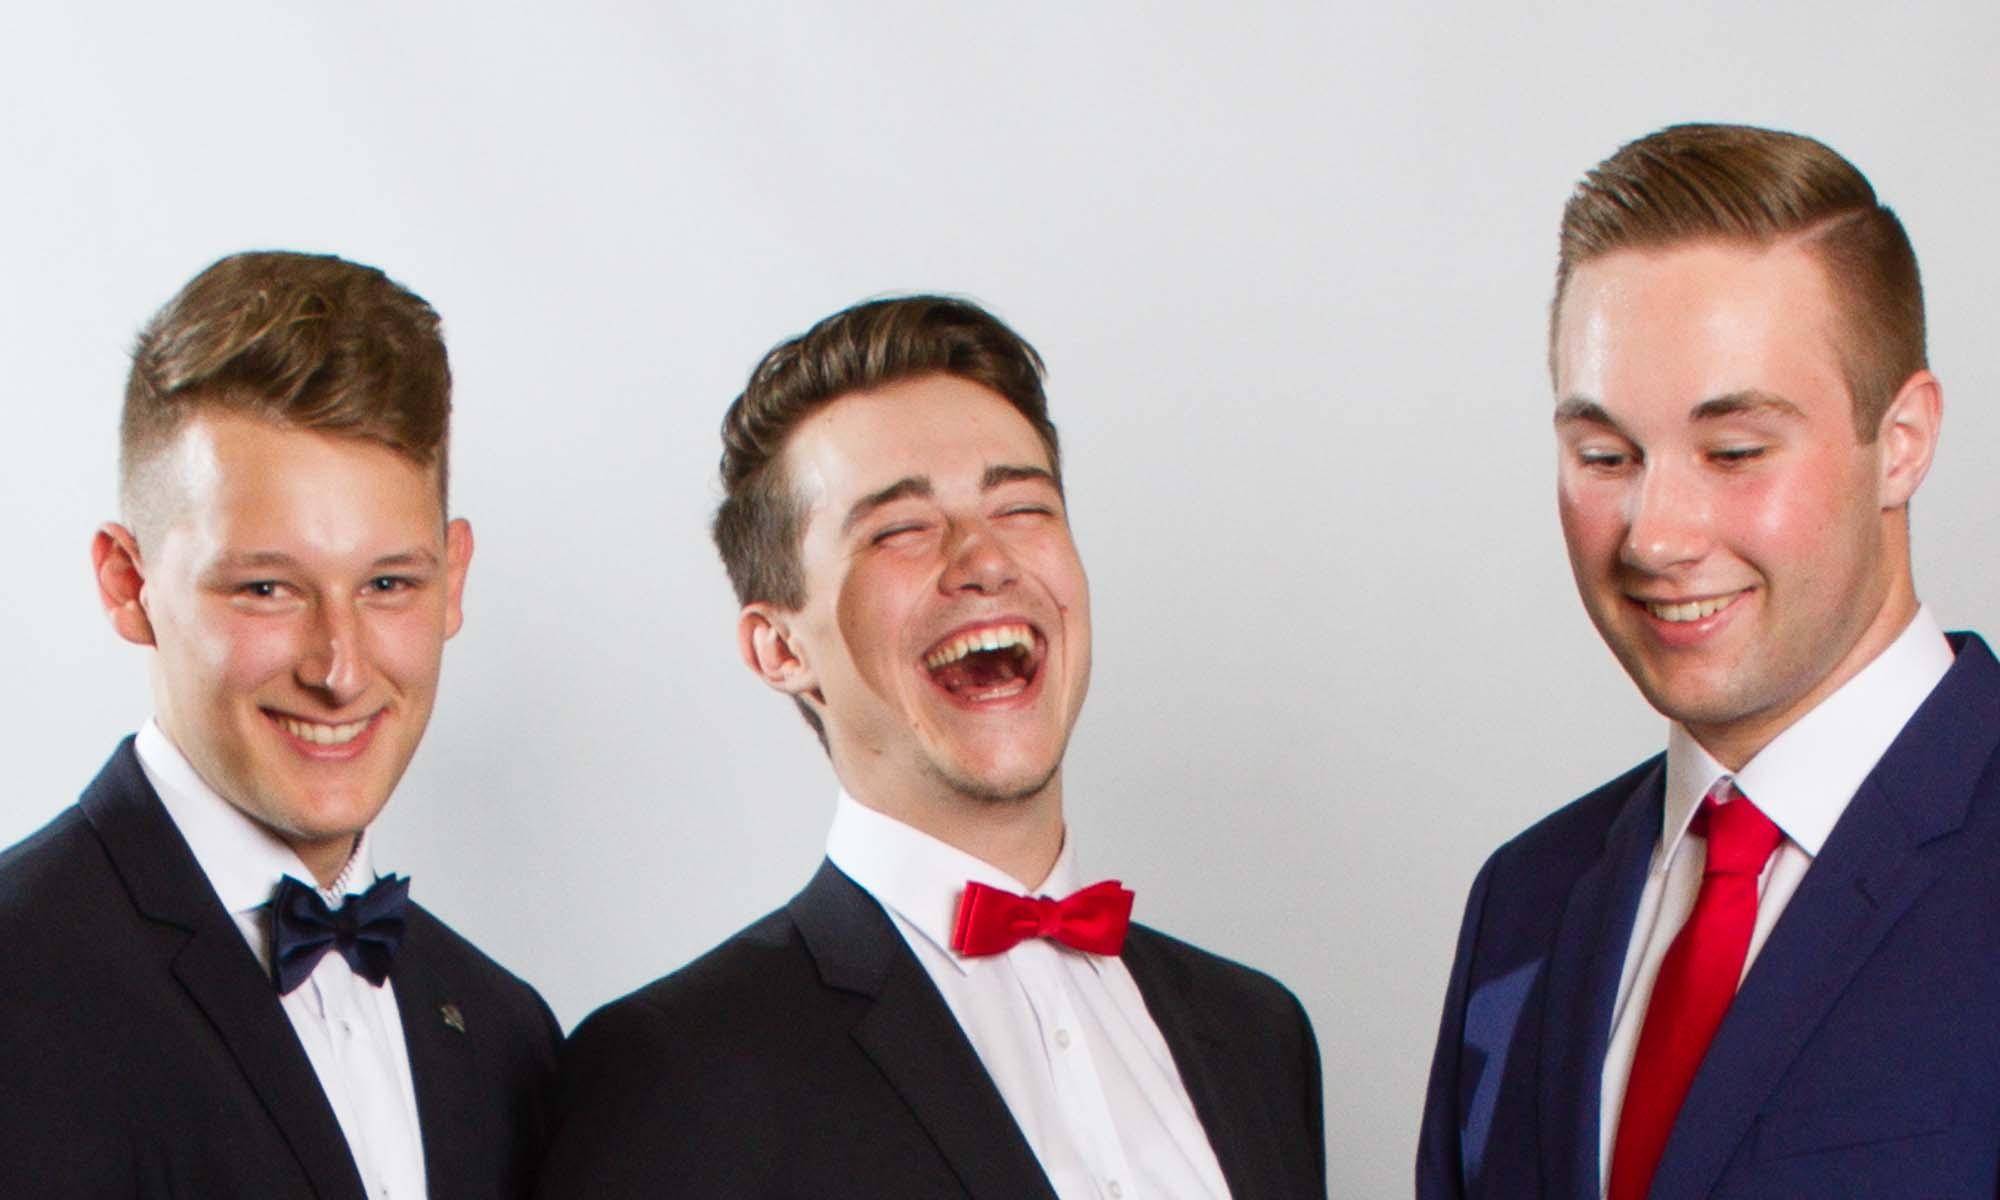 Drei junge Männer im Fotostudio beim Abiball.